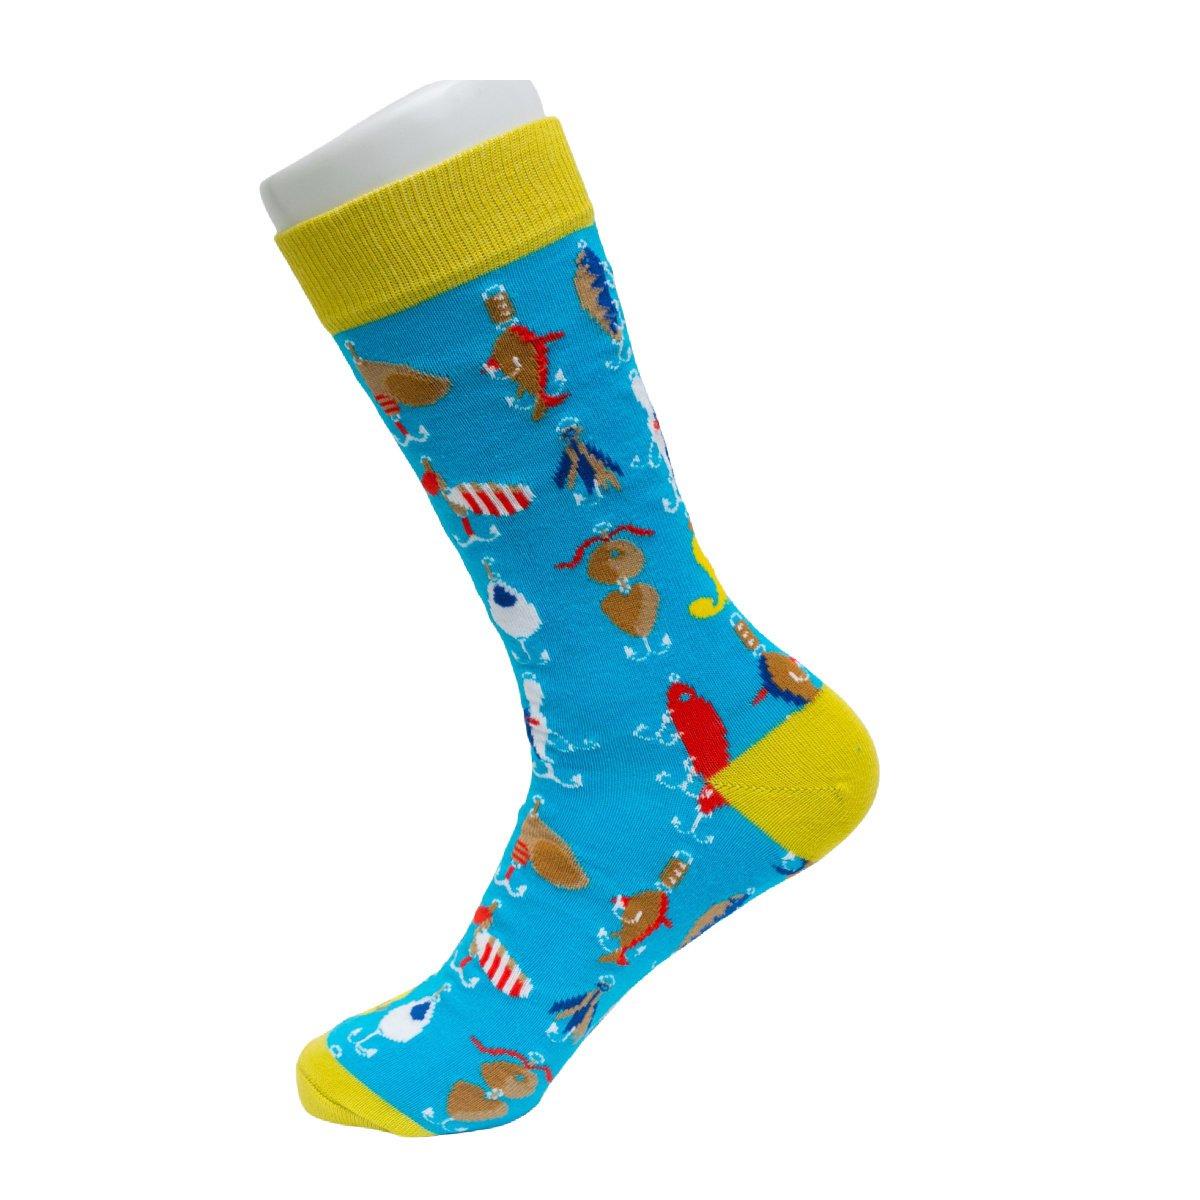 Socks Atomica Socks Atomica The Lure Of Fishing